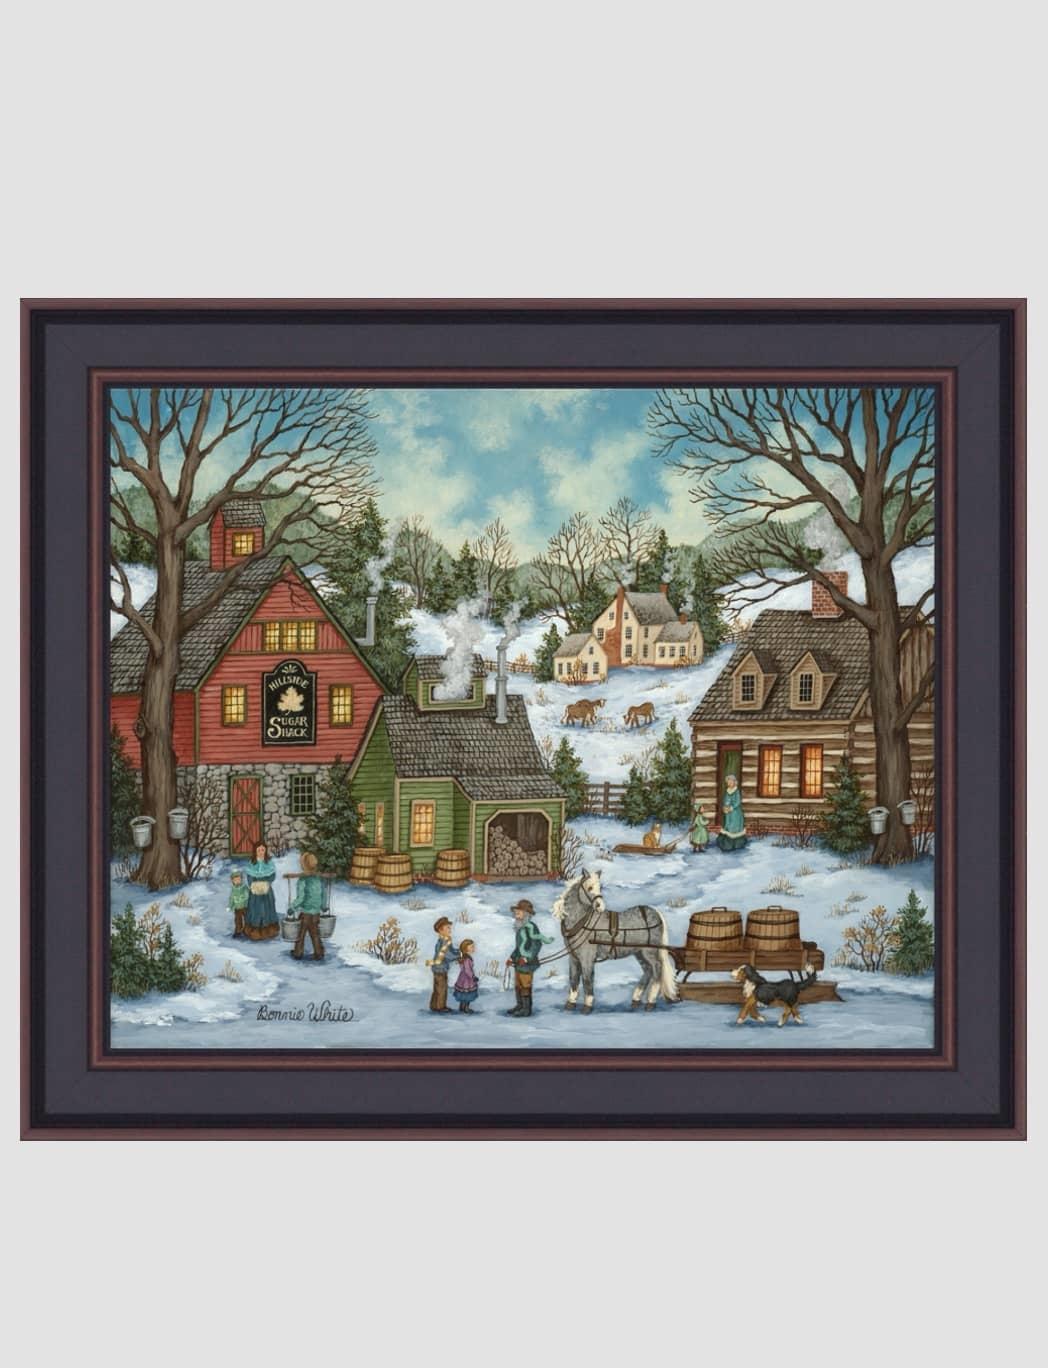 Bonnie White Hillside Sugar Shack Print by Bonnie White